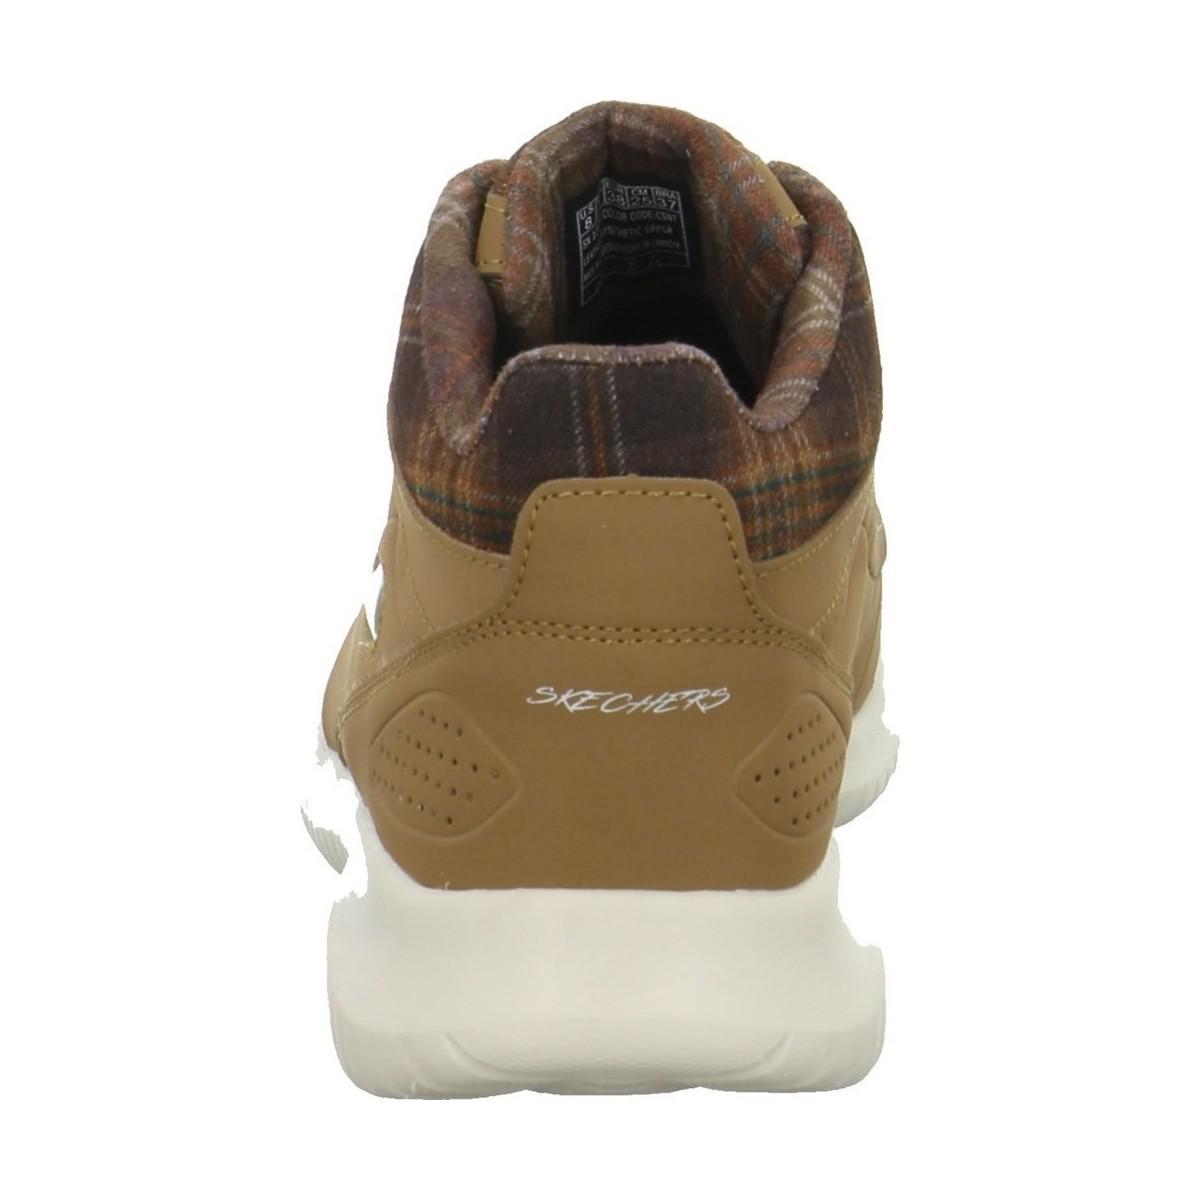 9ce4d9e36d54 Skechers - Ultra Flex Just Chill Women s Safety Boots In Brown - Lyst. View  fullscreen